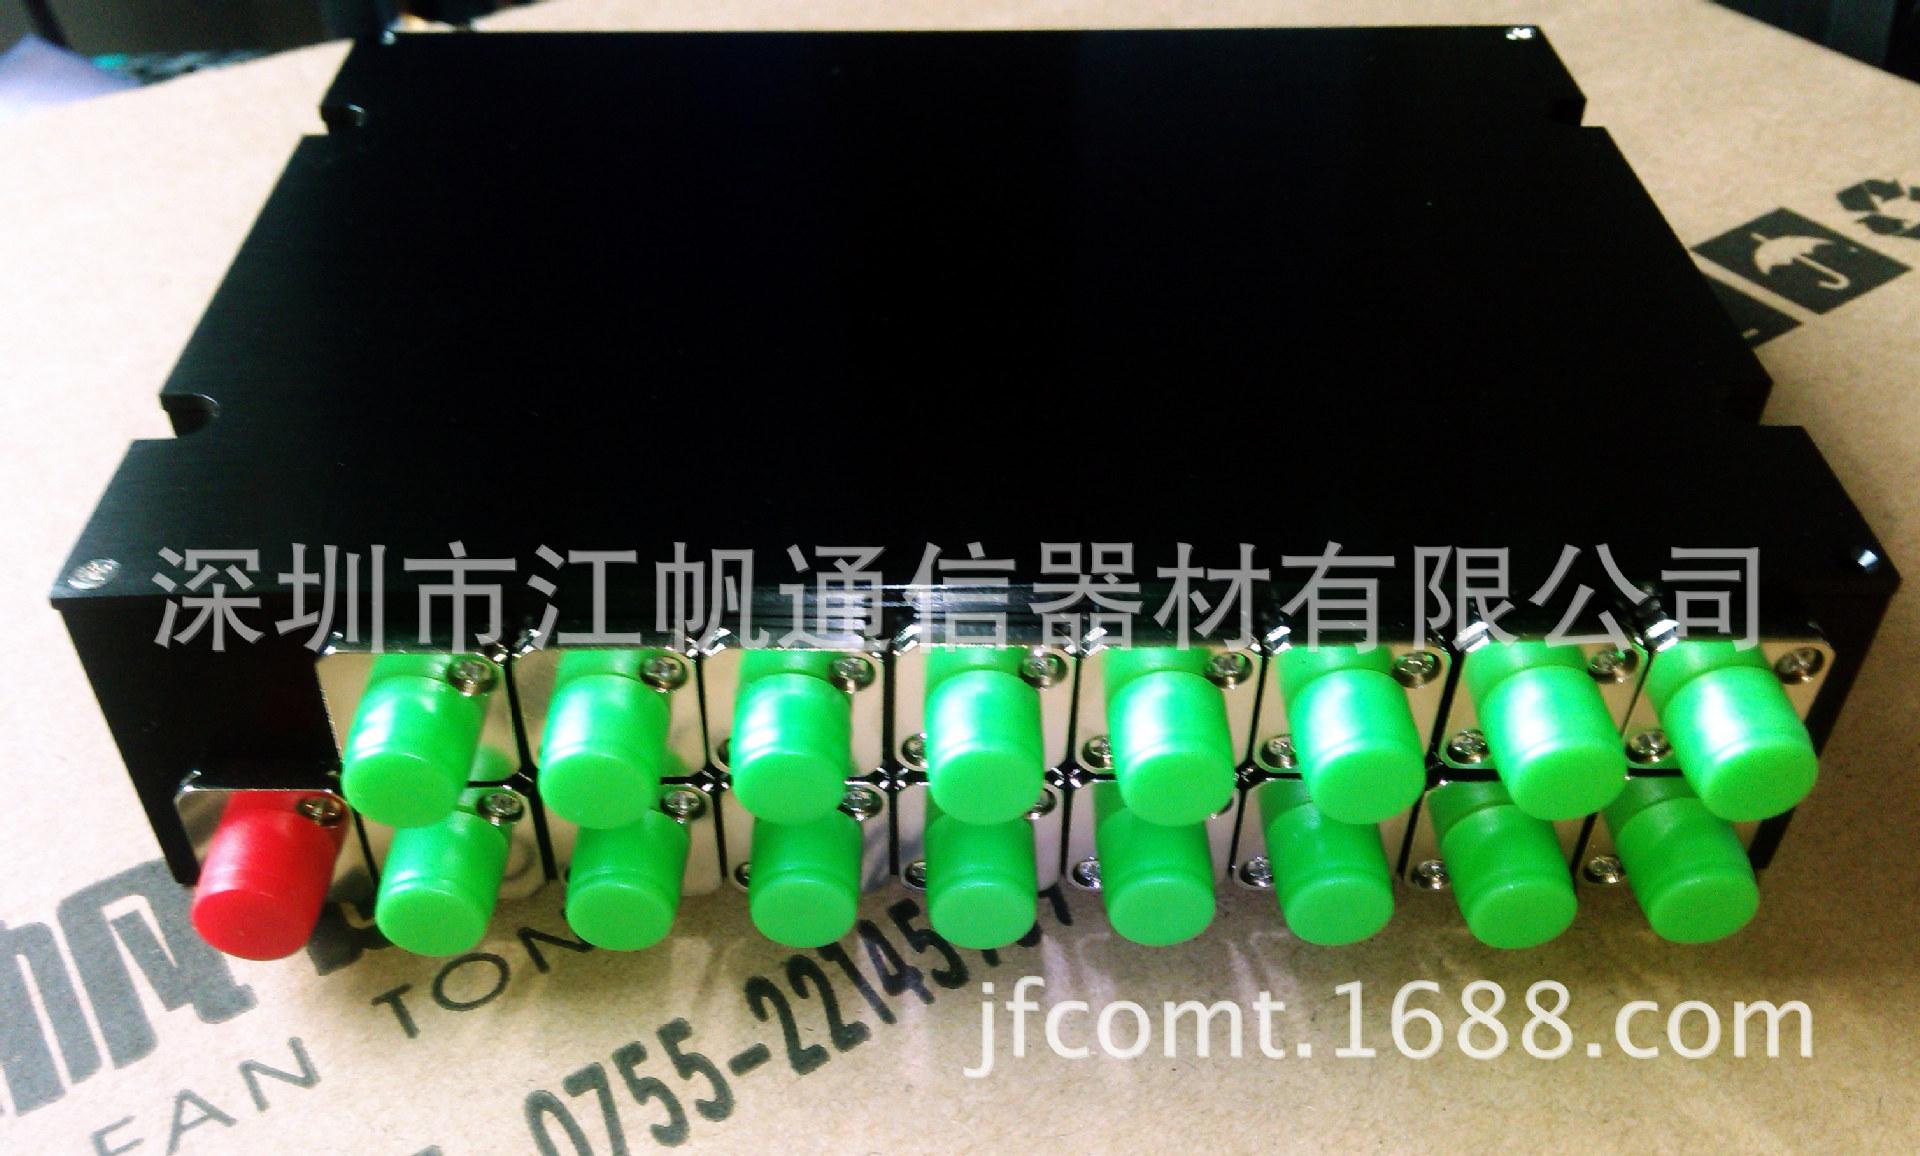 CNC加工/铝压铸加工/铝件/铝型材加工/DIY零件加工/铝合金/腔体